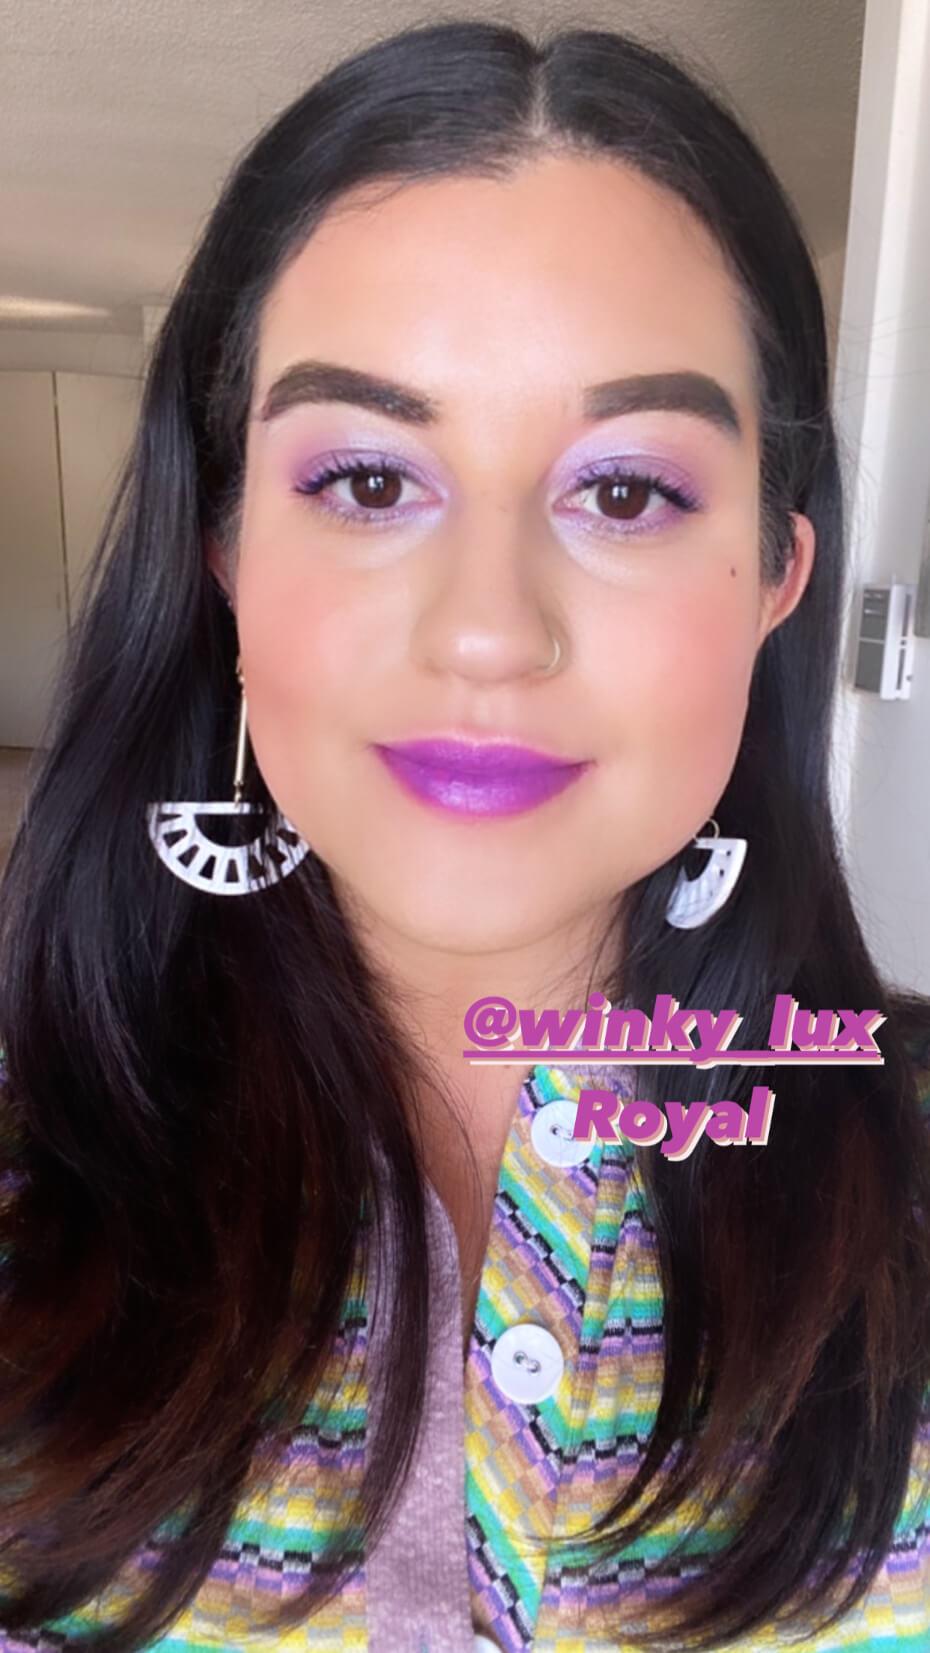 purple-lipsticks-winky-lux-royal-050520